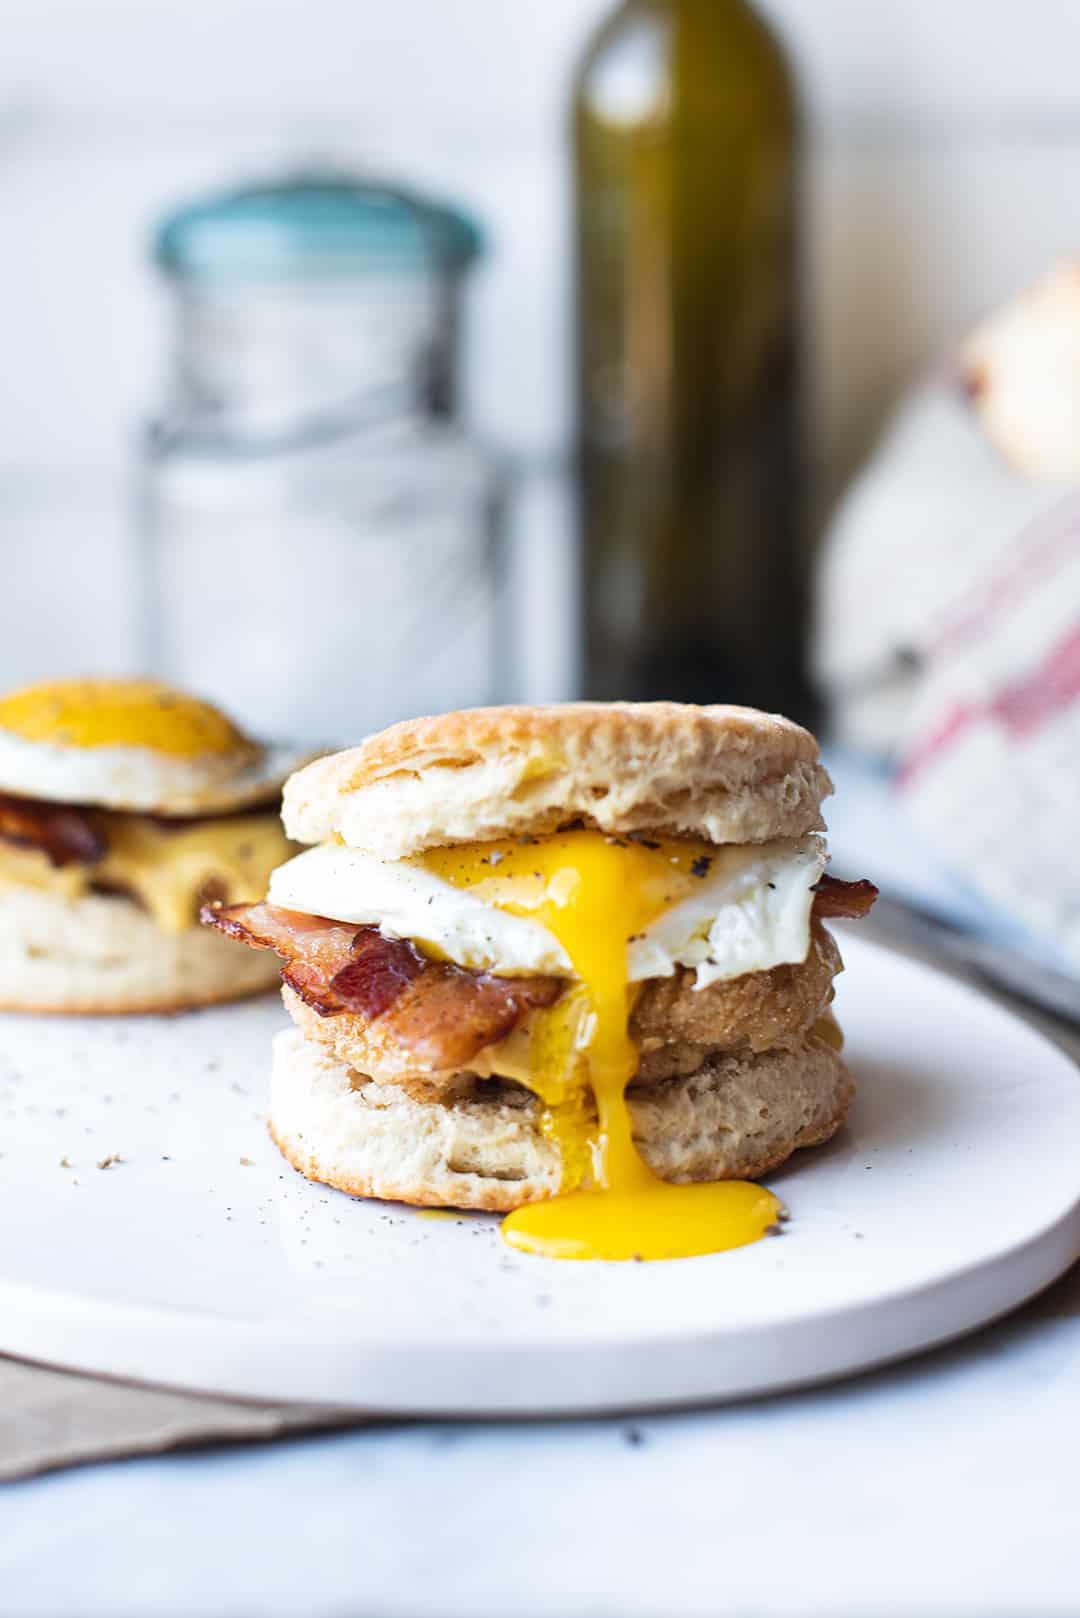 chicken & biscuit sandwich with runny yolk on white plate